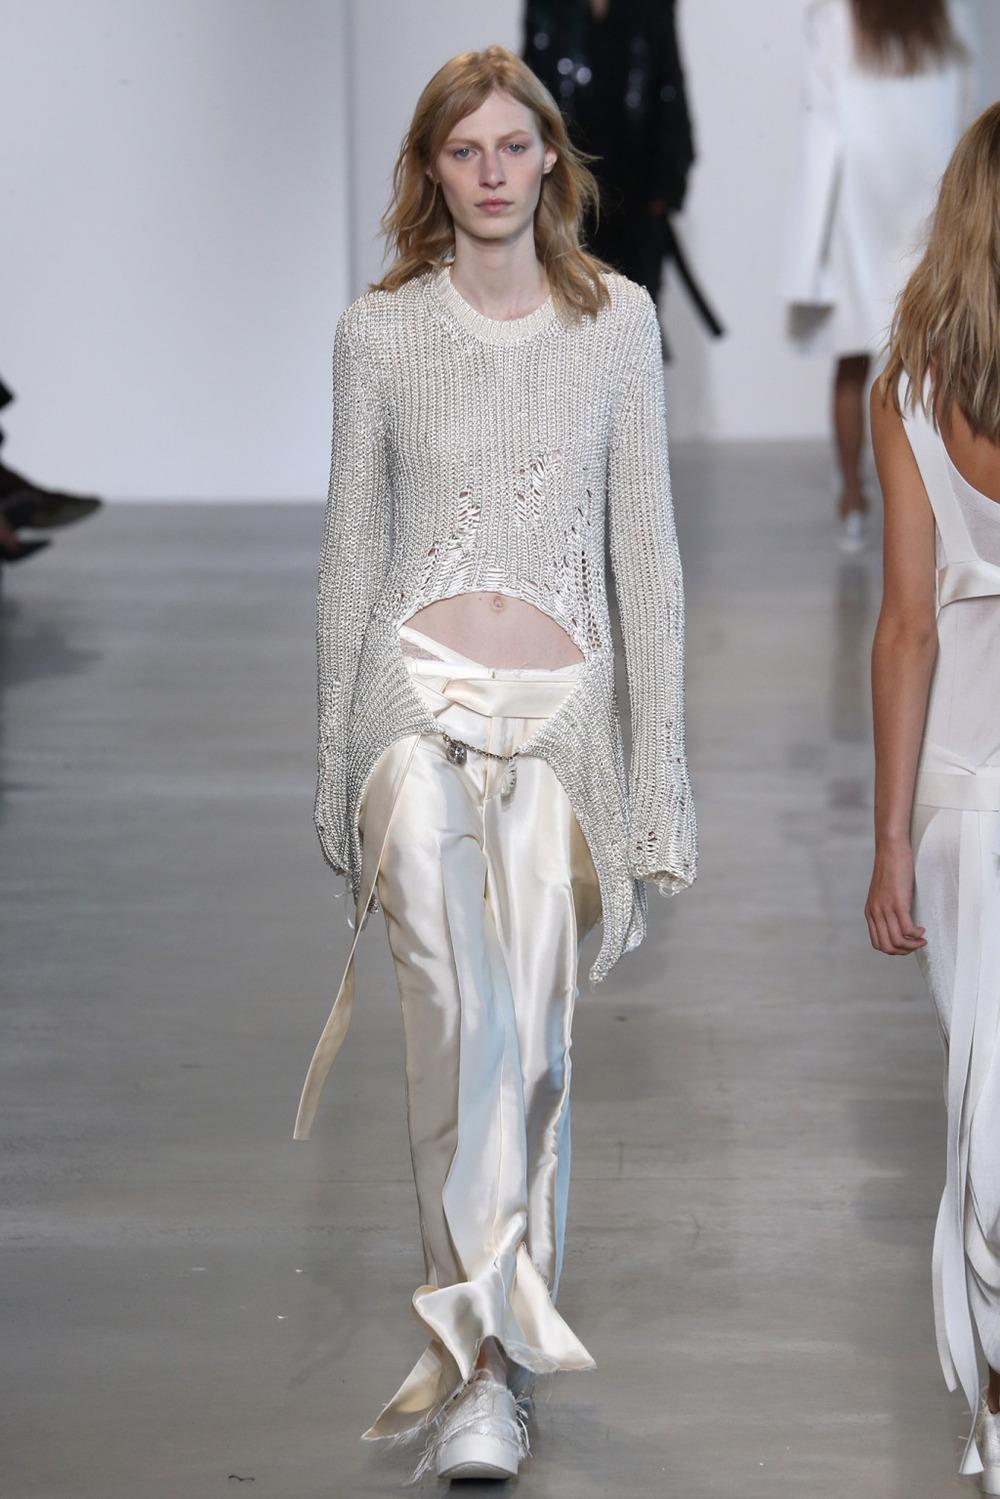 Machine Knit Jacket // Calvin Klein Ready-To-Wear 2016 // NY, NY   Machine Knitting Production   Photo courtesy of  WWD